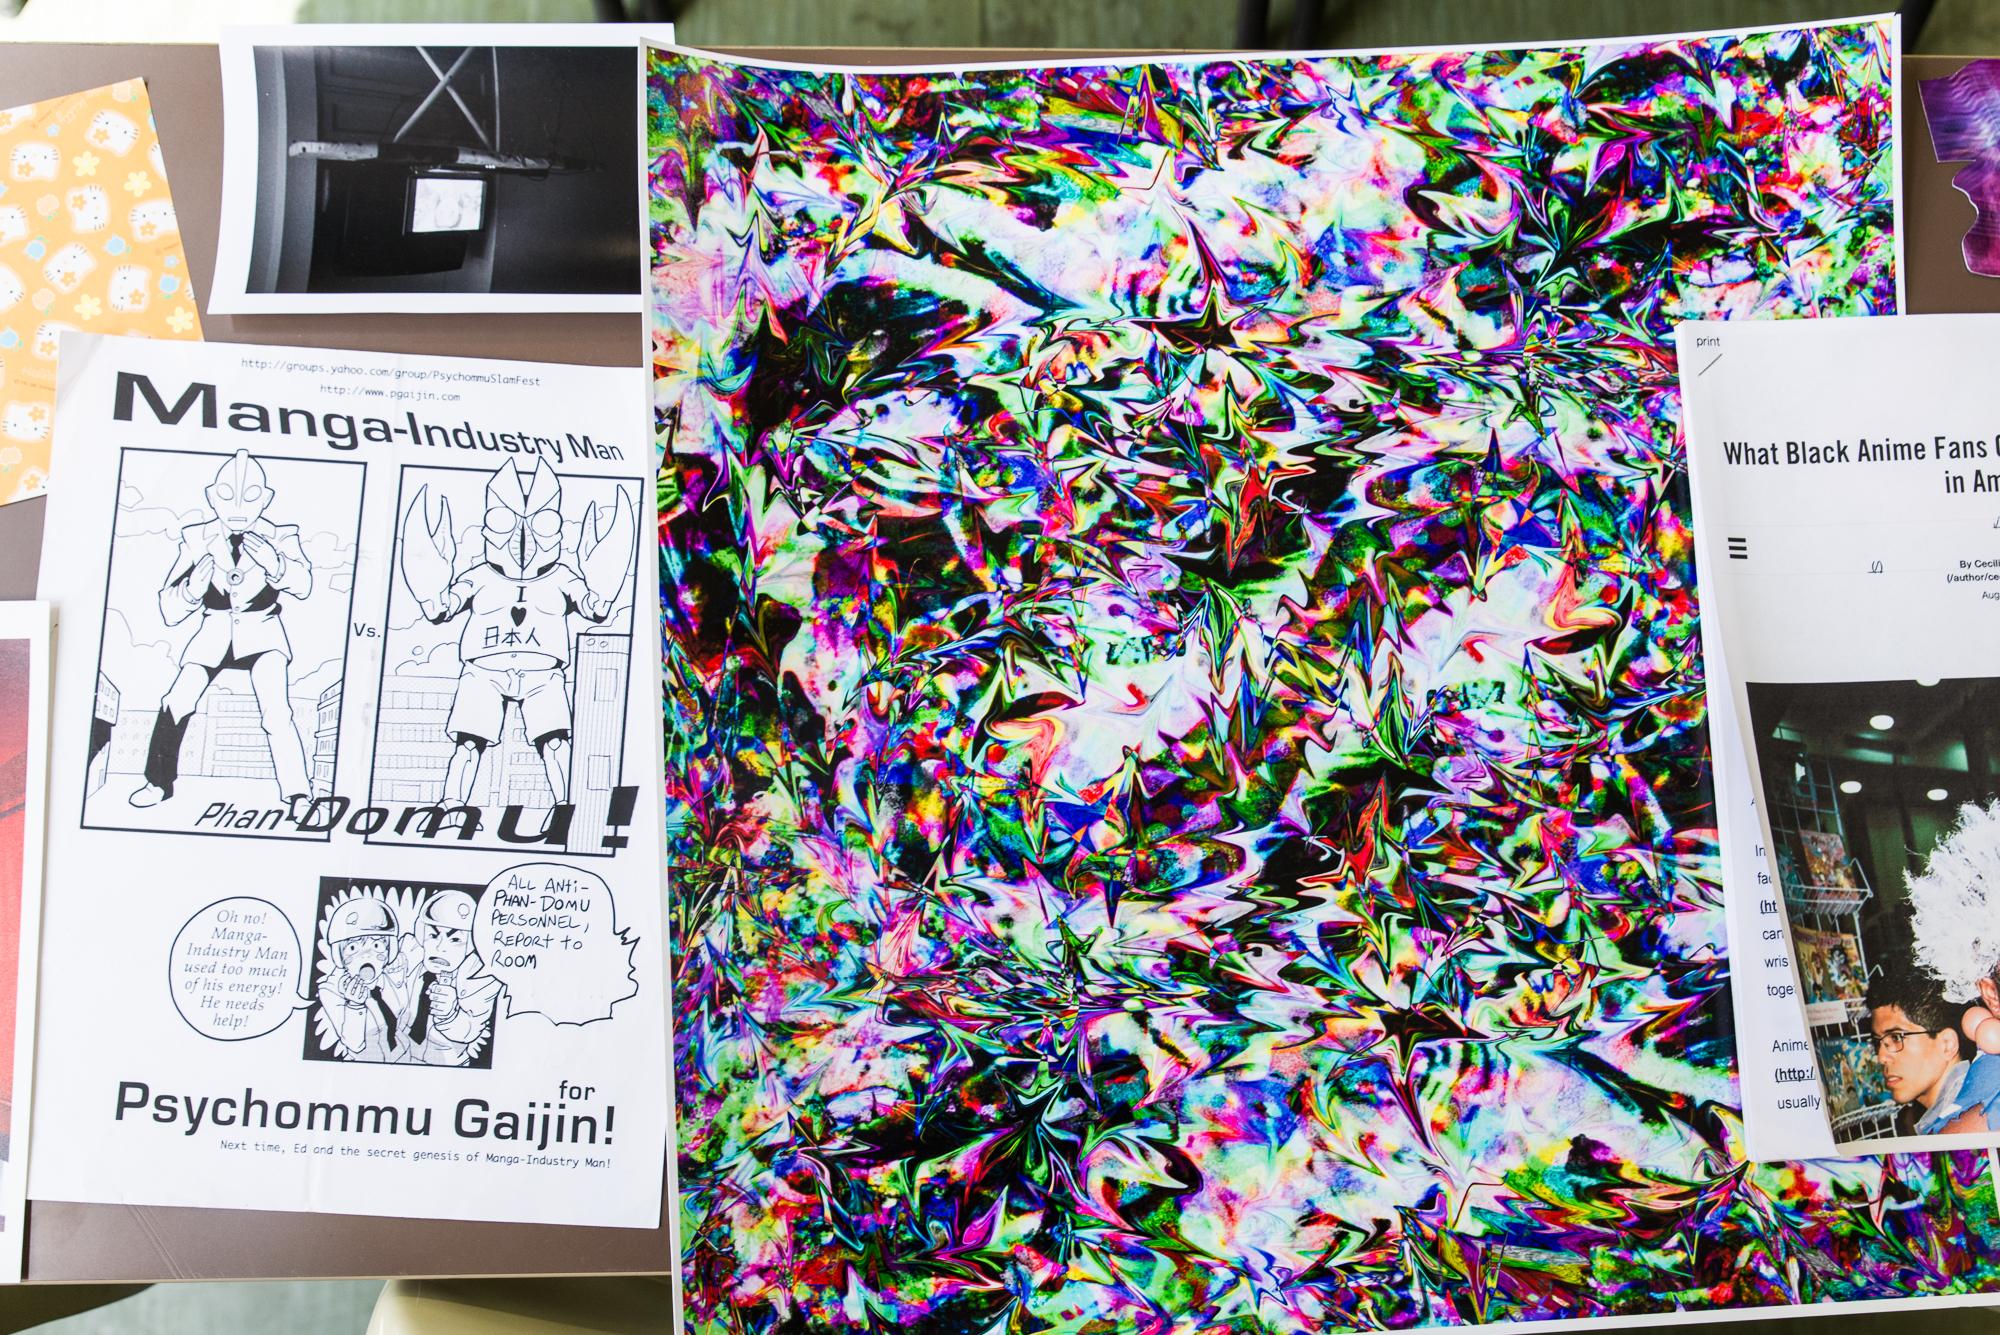 Eron Rauch Bad Fan Museum-8.jpg